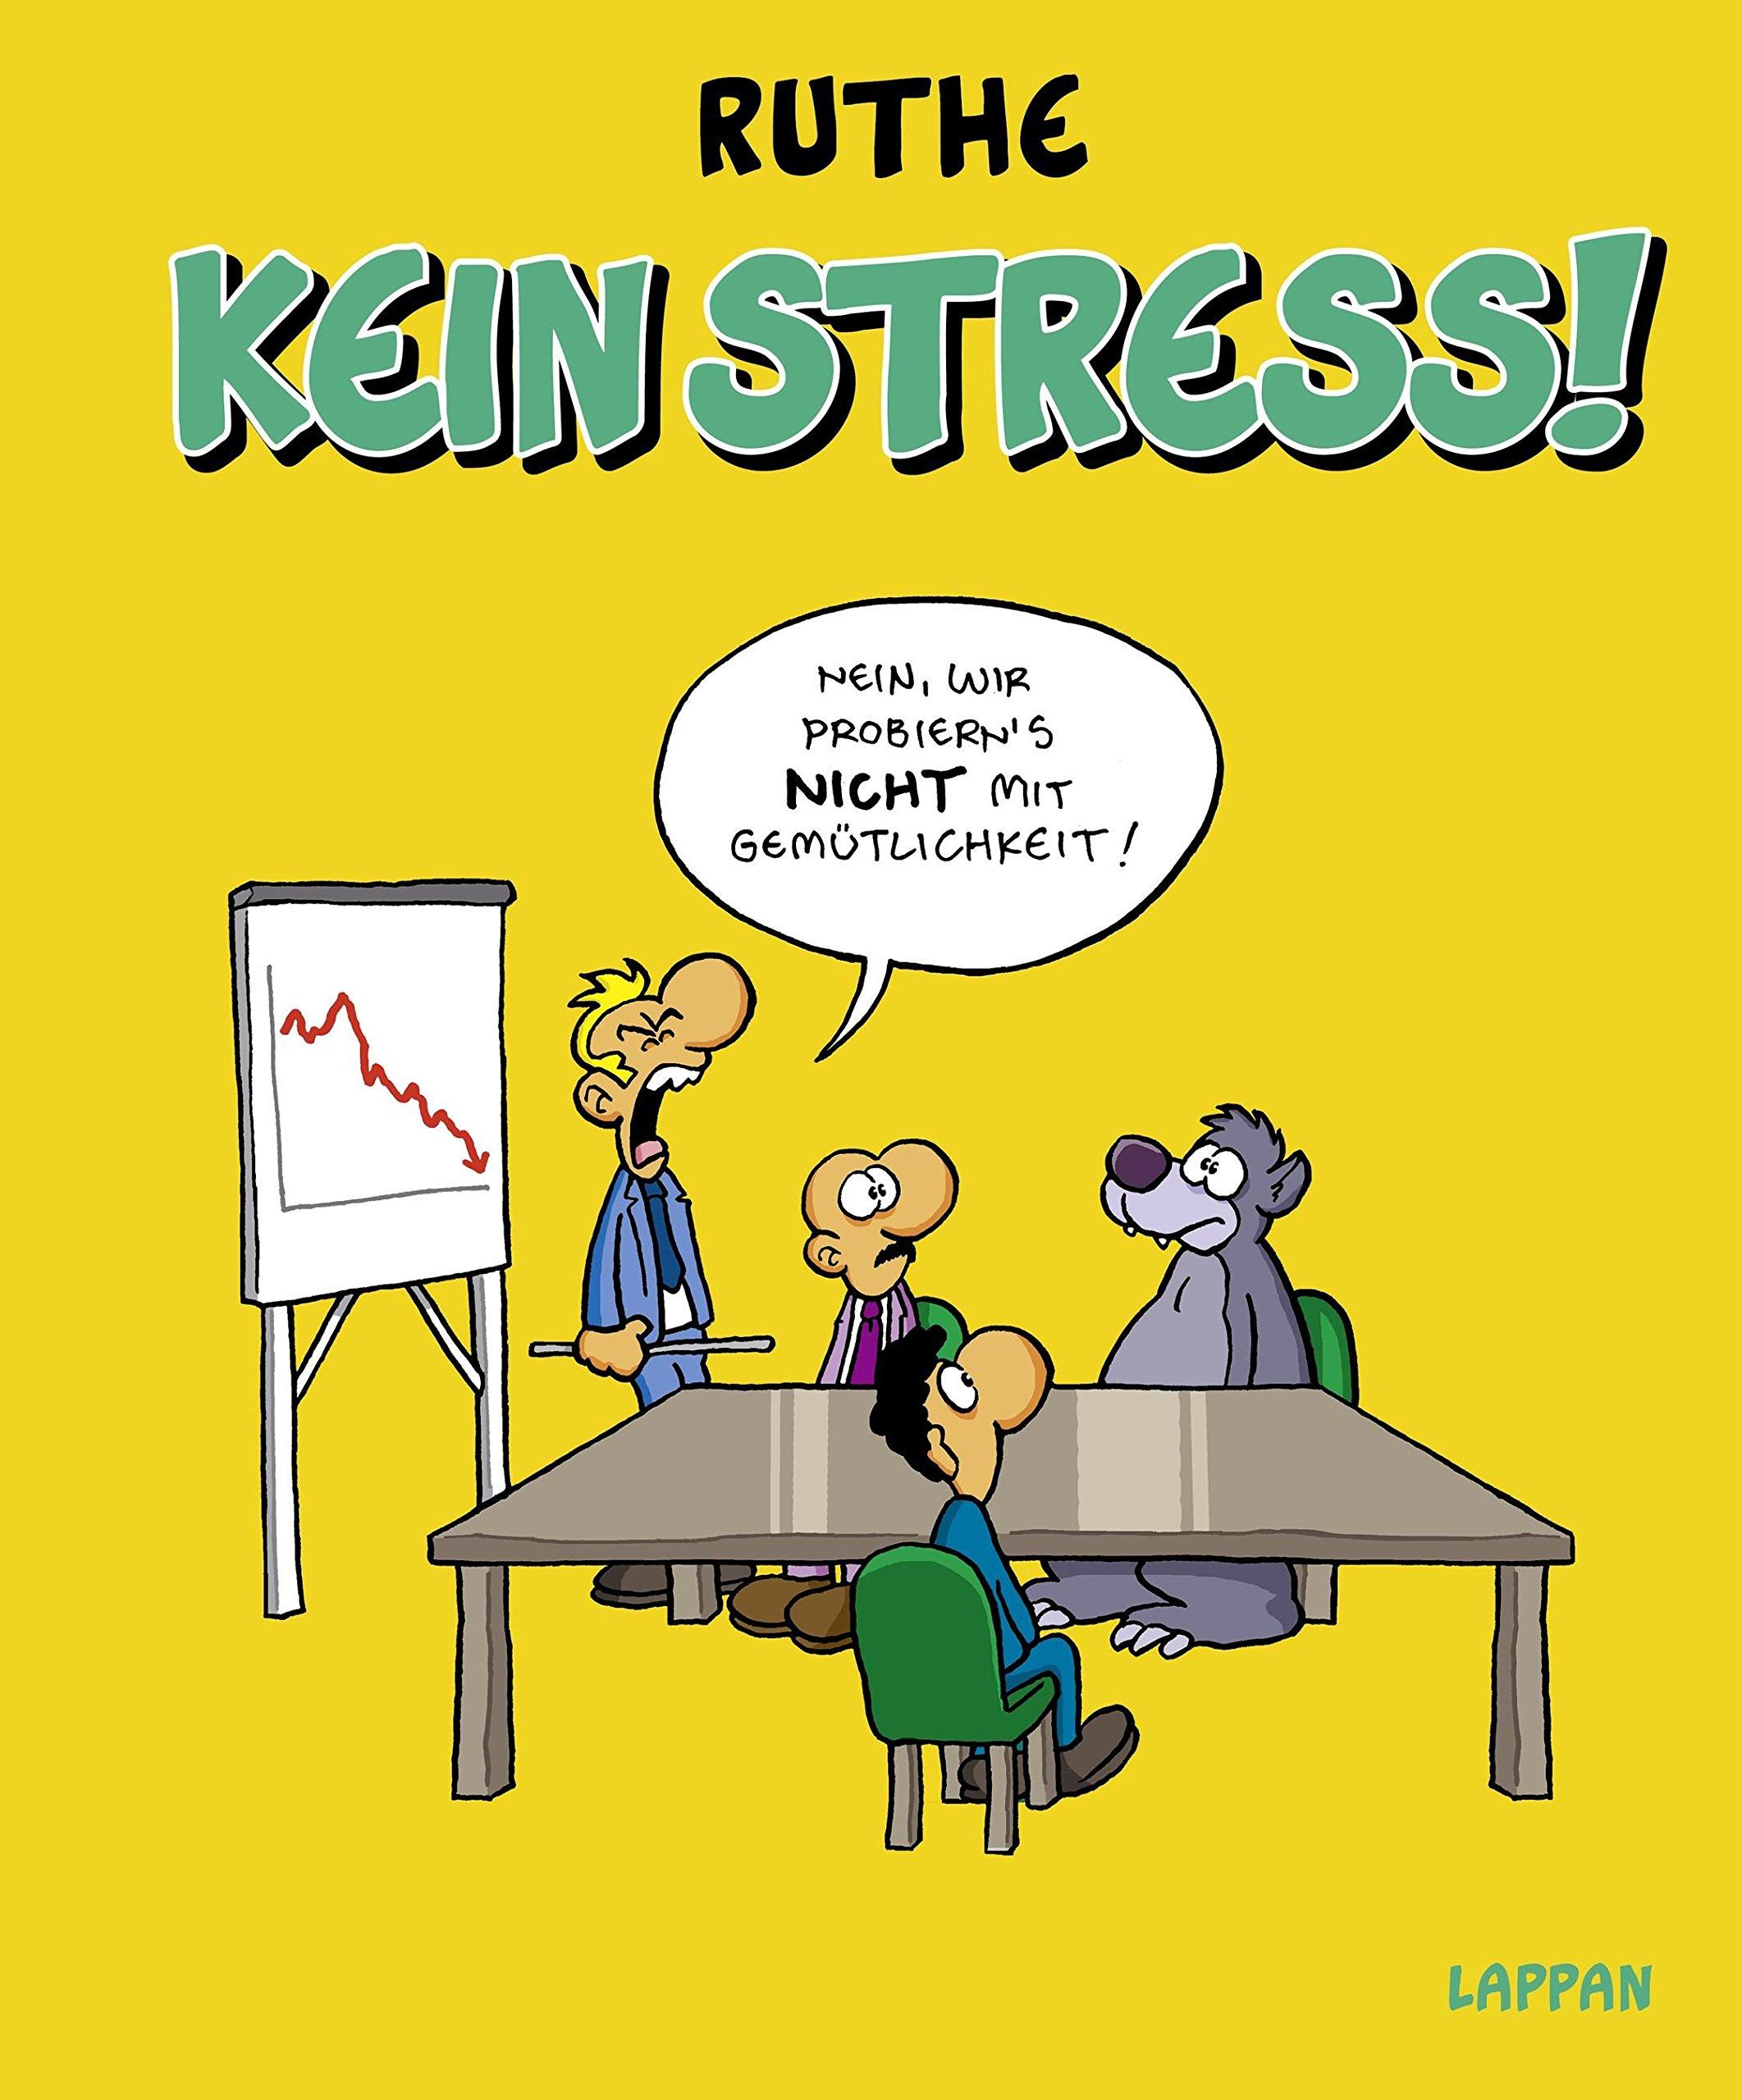 Kein Stress! (Shit happens!) Gebundenes Buch – 25. November 2016 Ralph Ruthe Lappan 3830334699 HUMOR / General